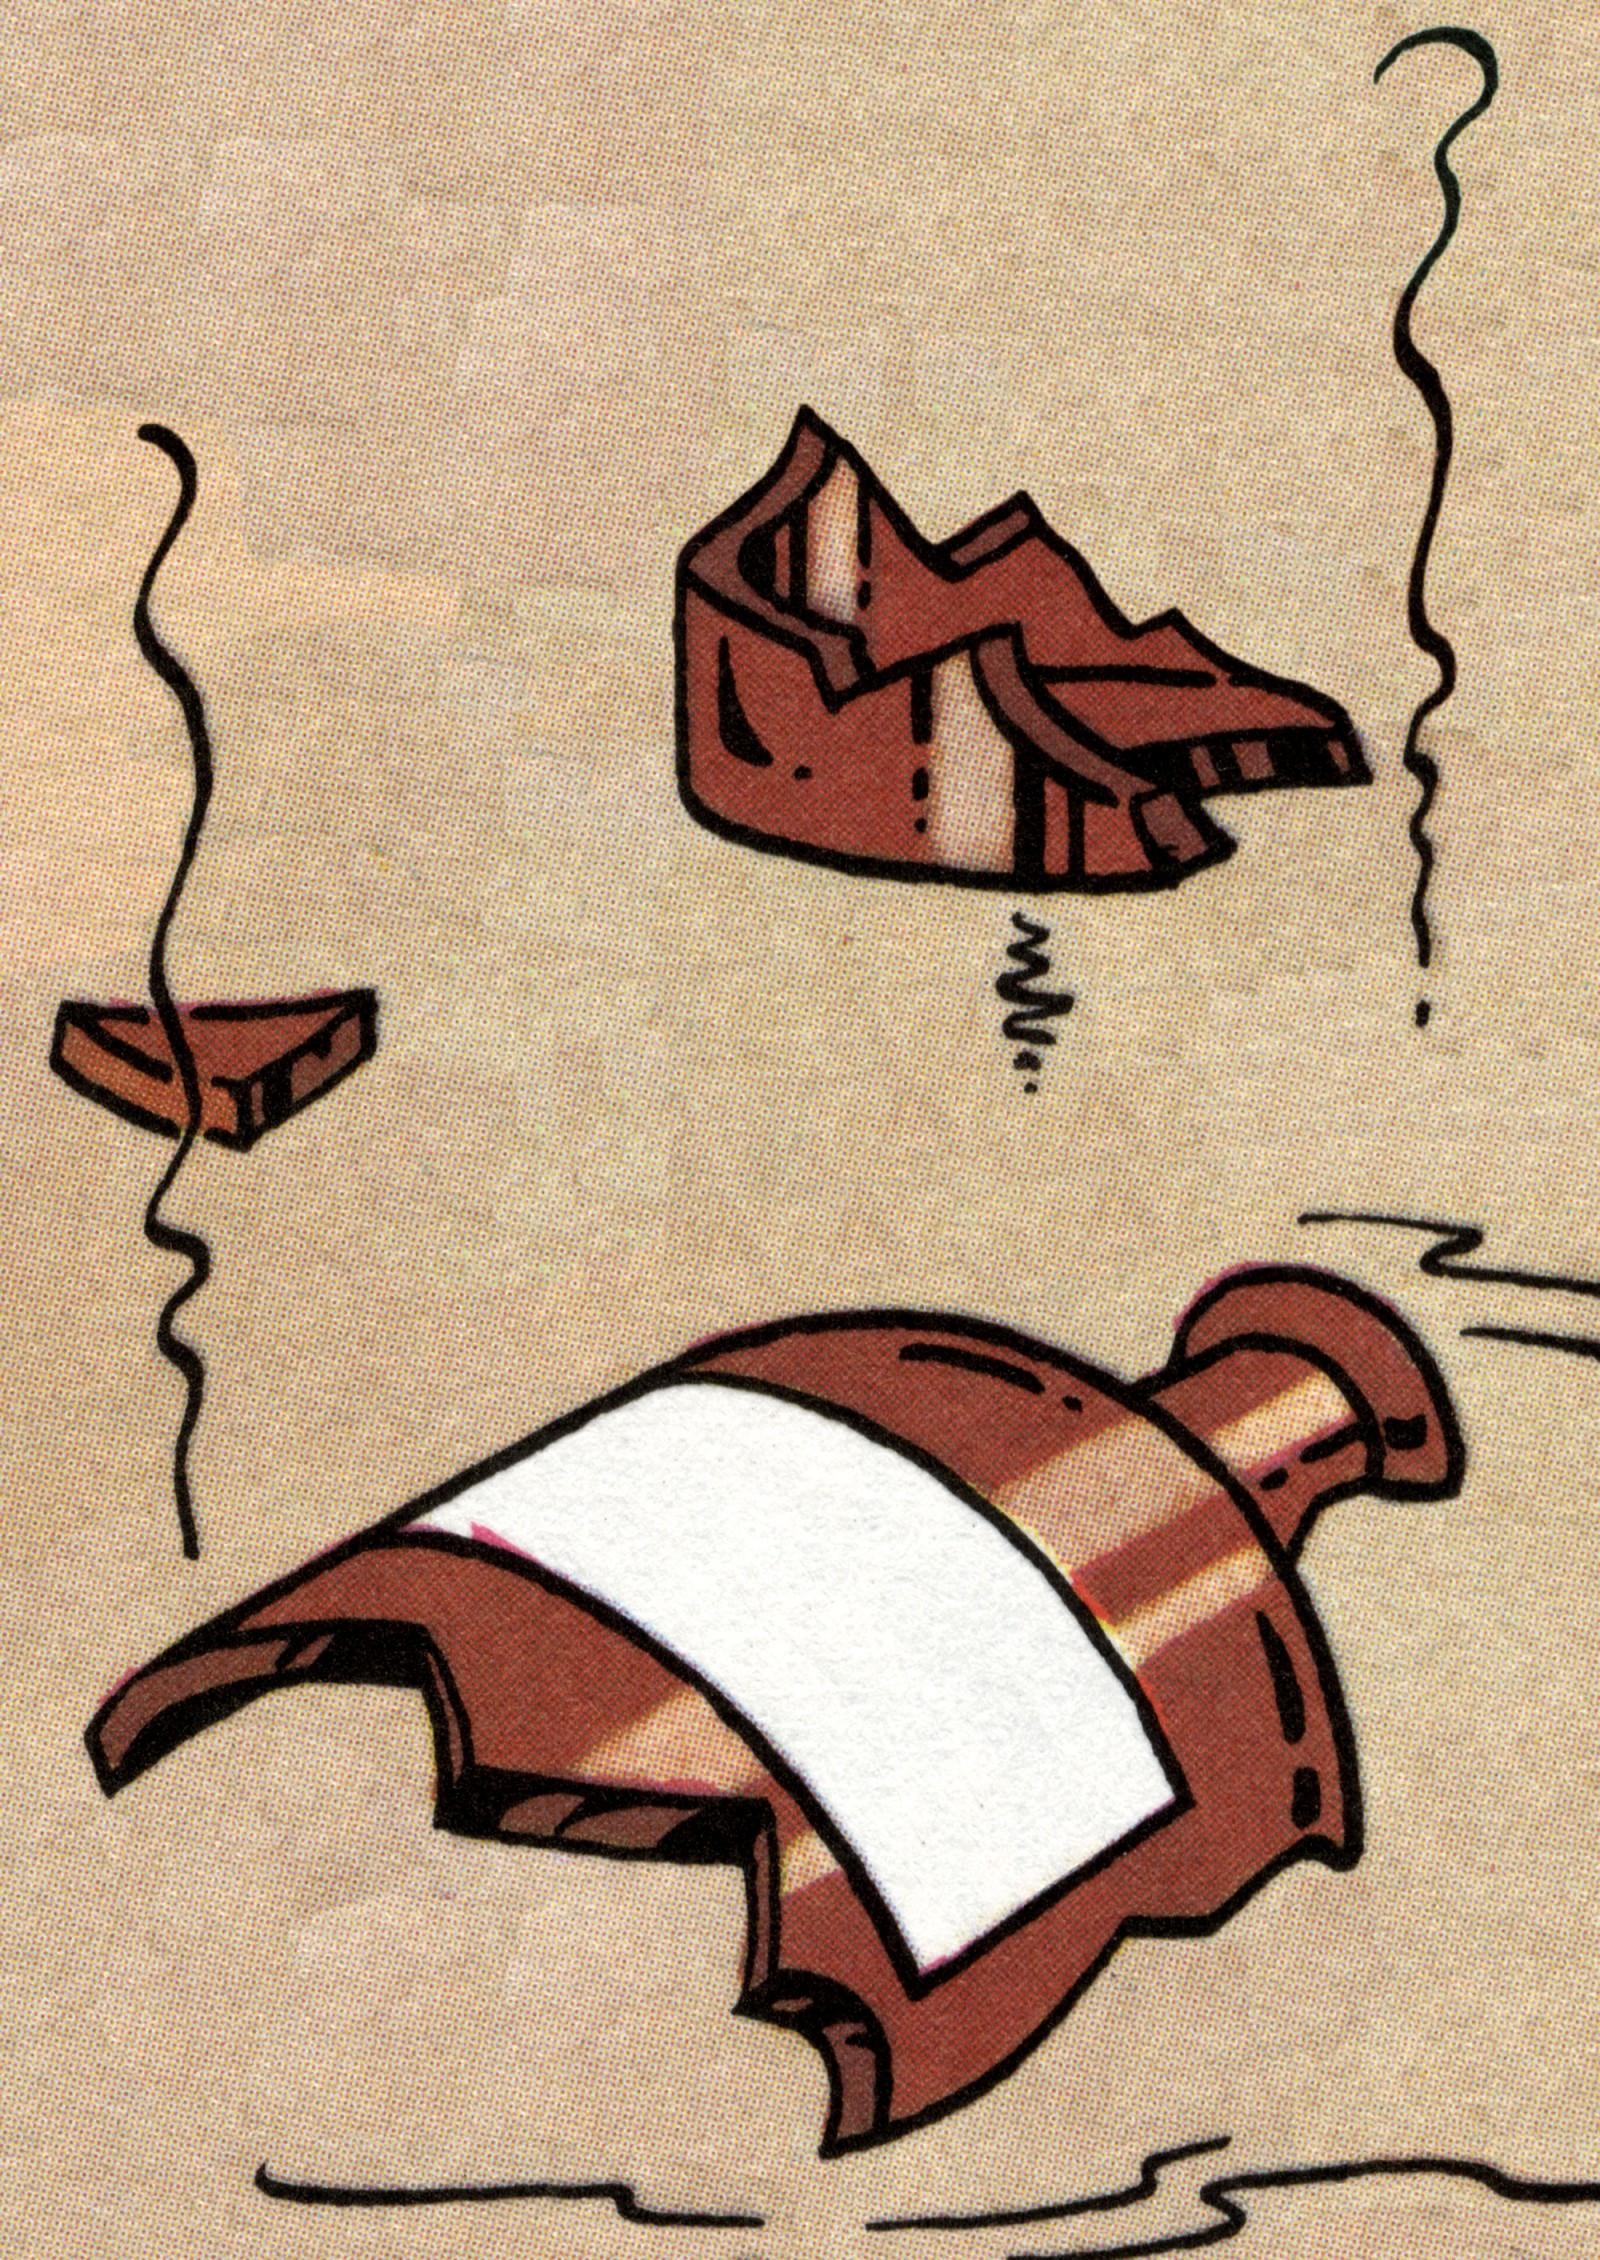 Kim Nekarda: Chloroform, 2006, print on photo paper, 21 x 29,7 cm, edition 6